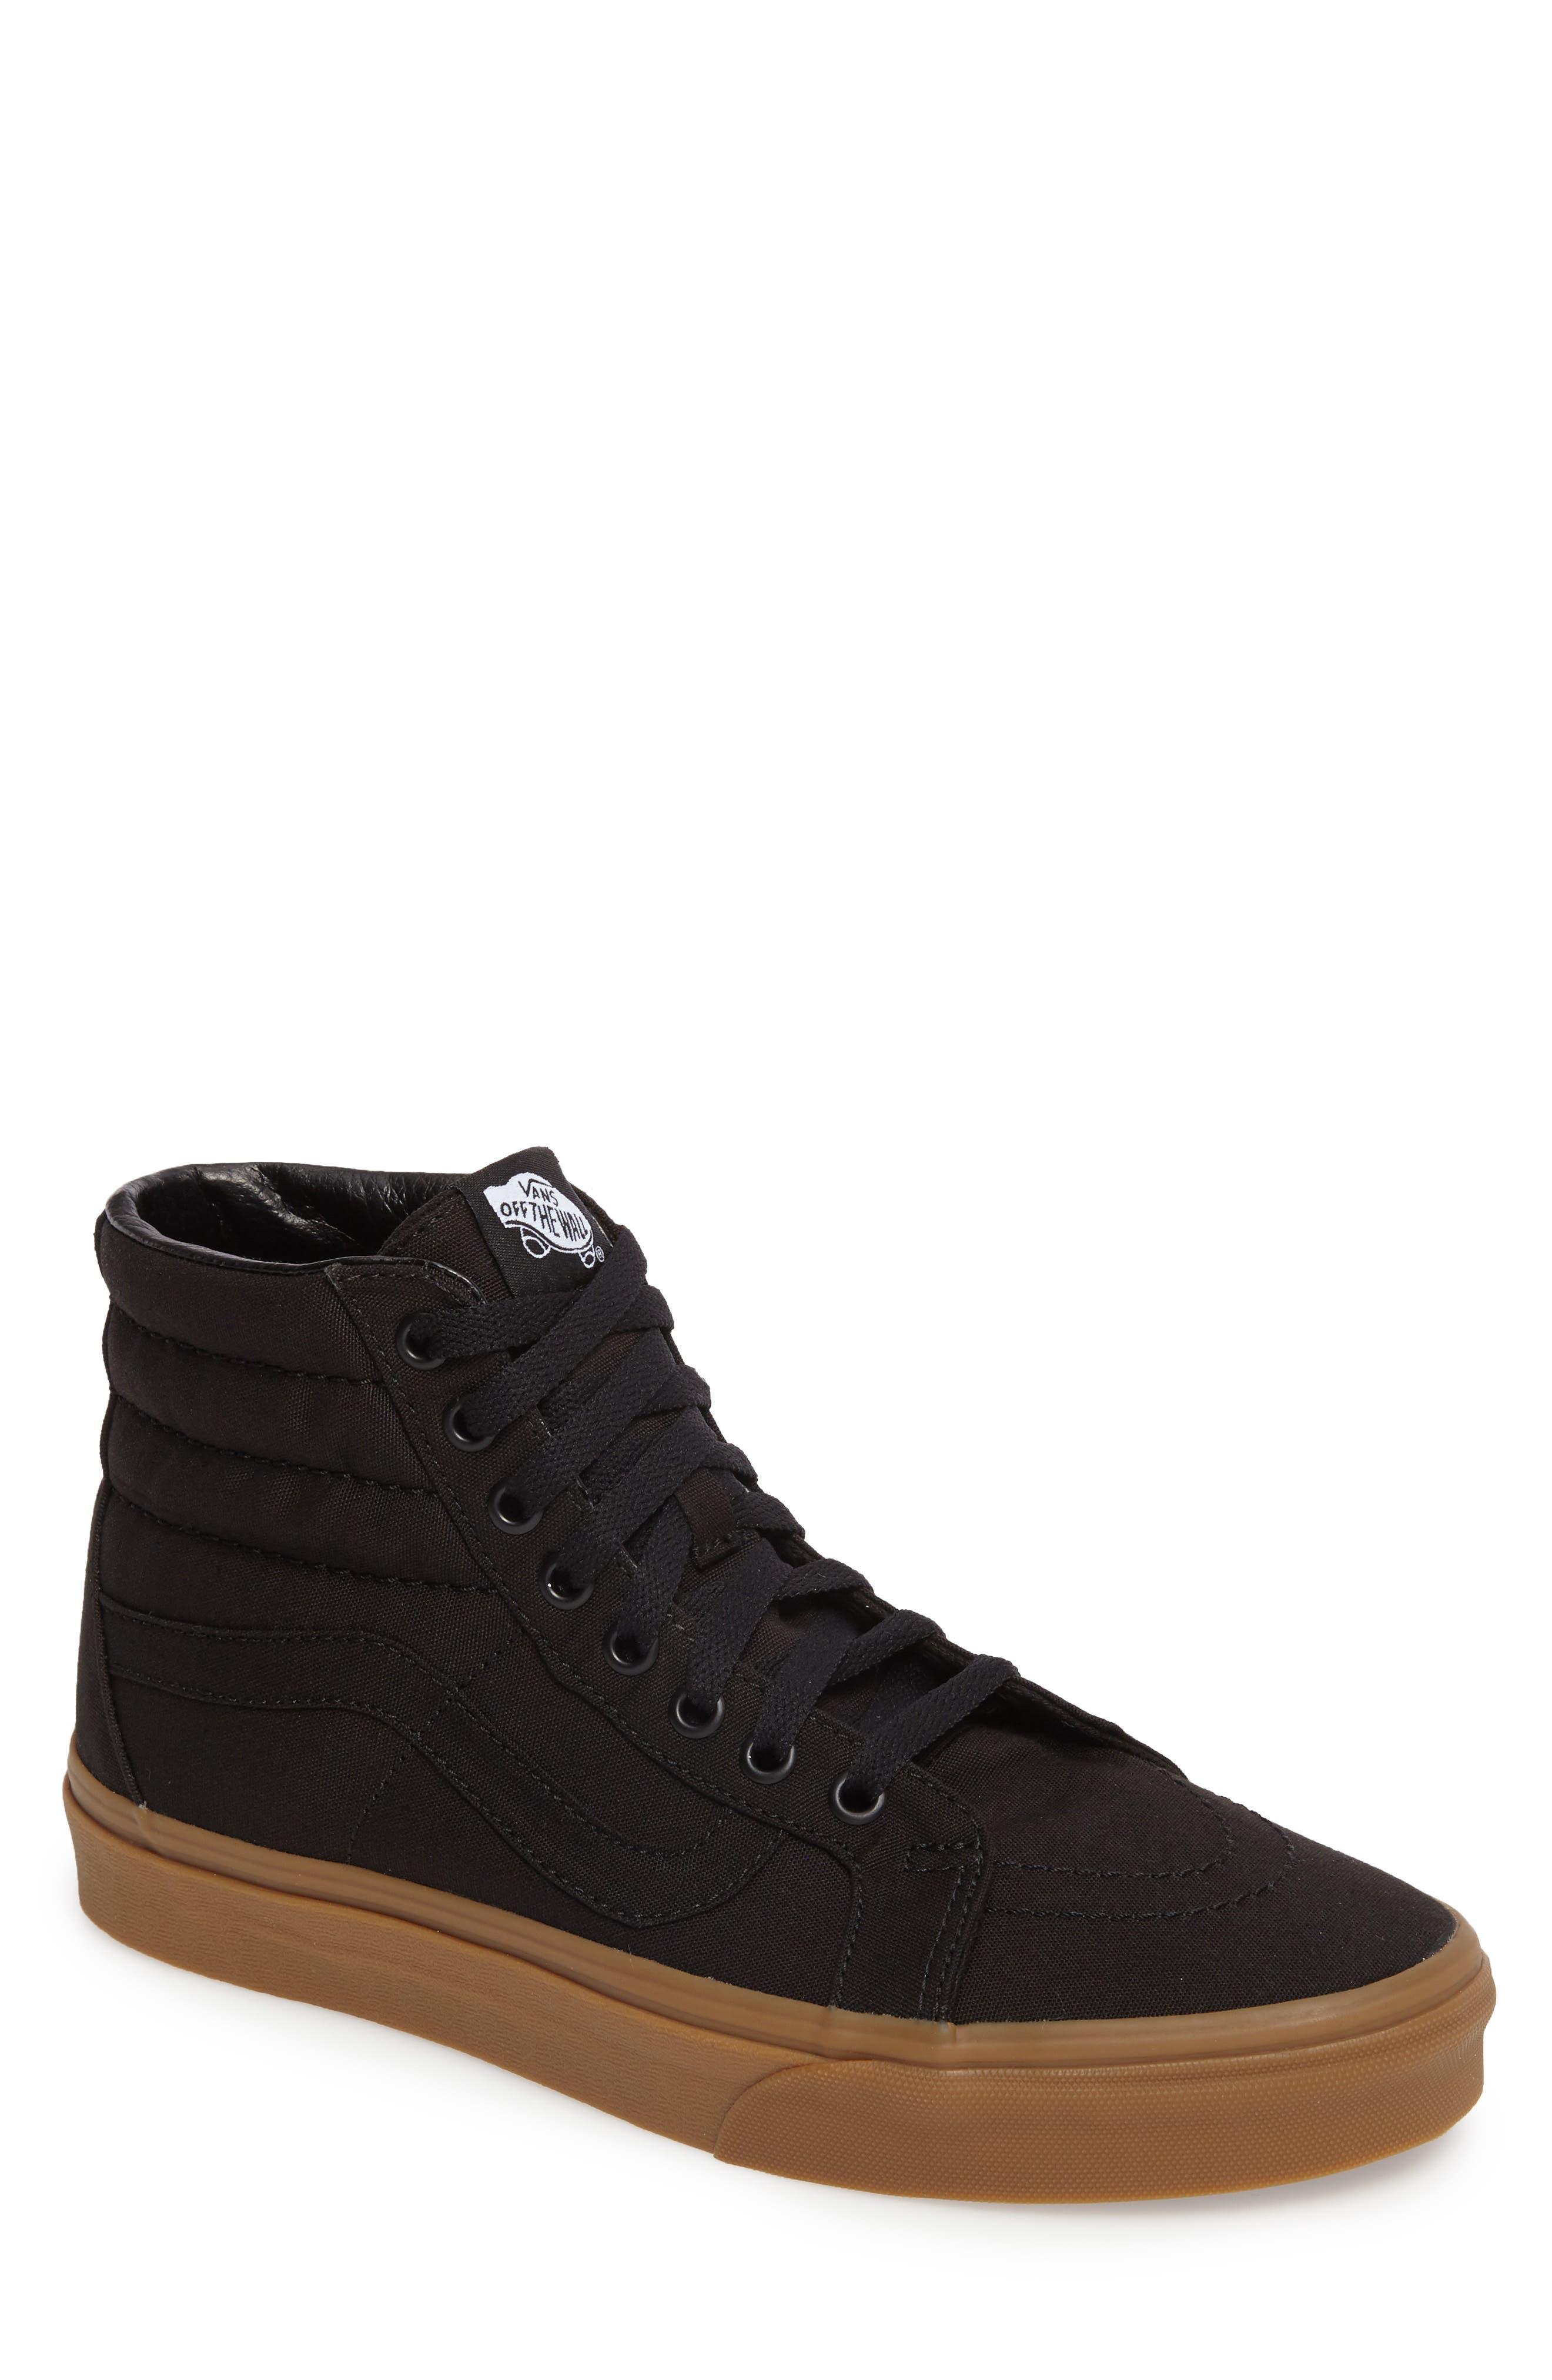 'Sk8-Hi Reissue' Sneaker,                             Main thumbnail 1, color,                             002